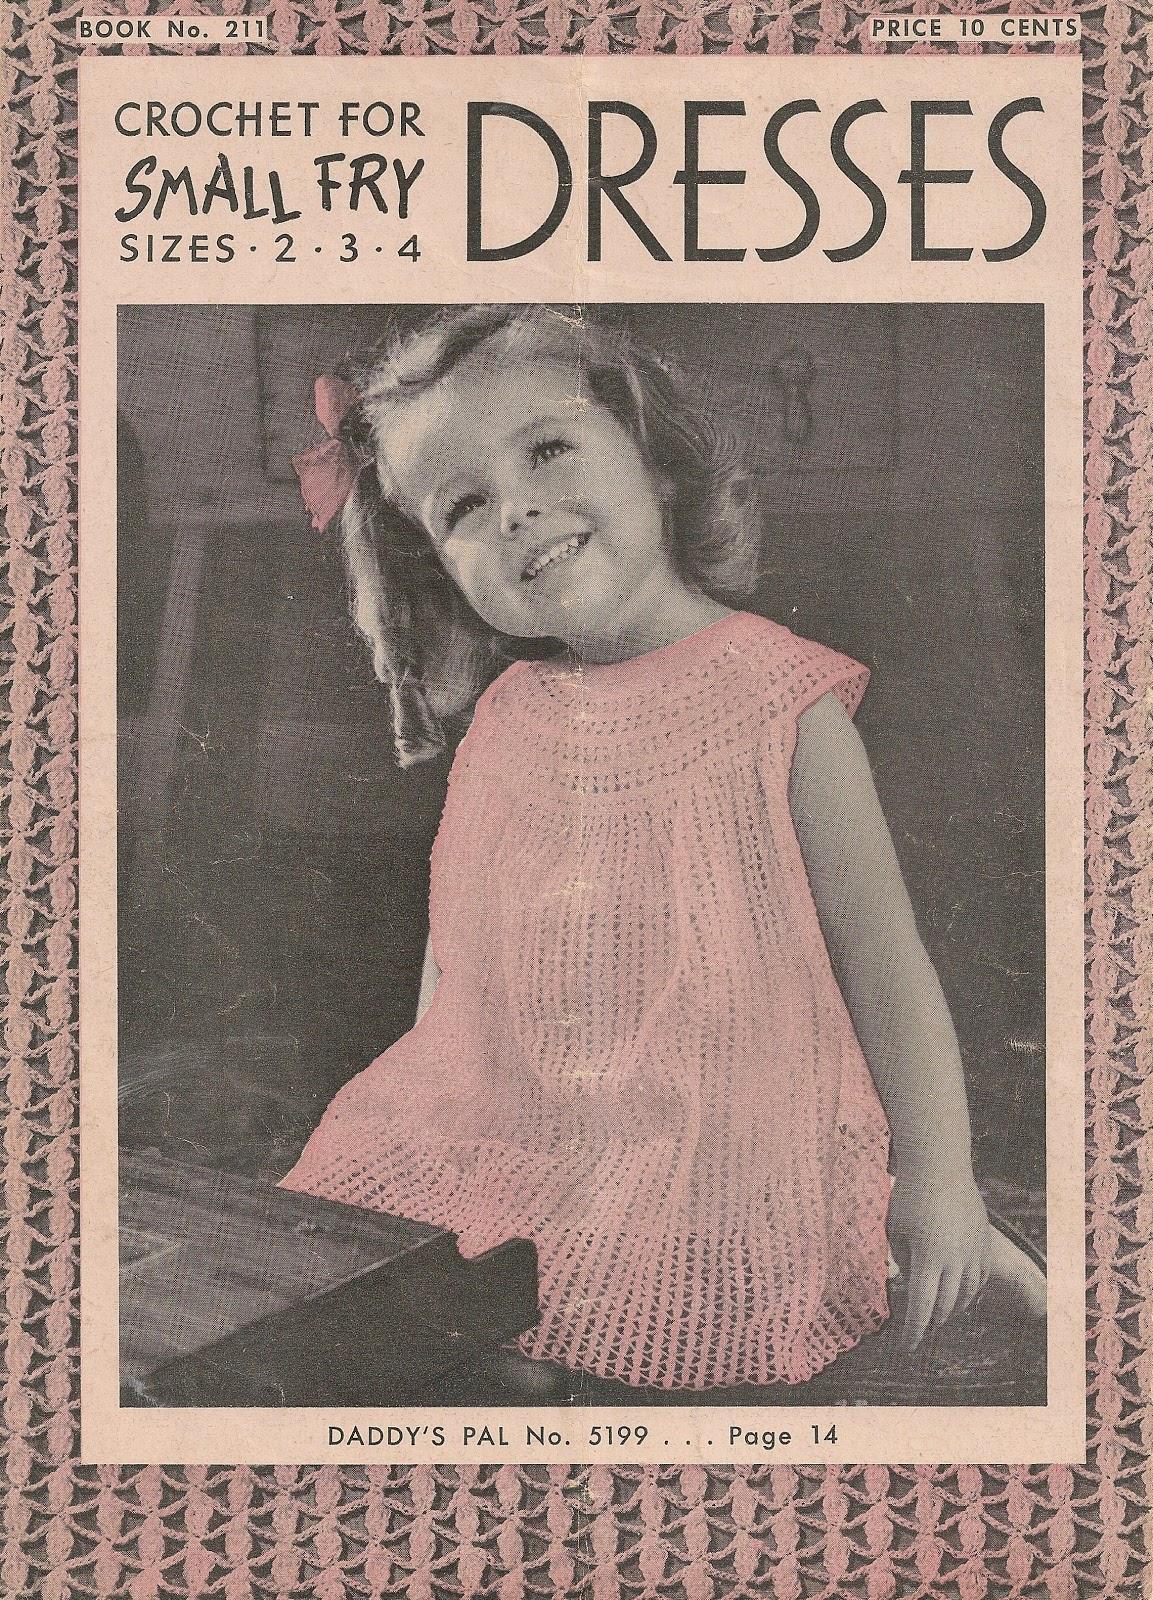 Sentimental Baby Little Girls Dress Crochet Pattern